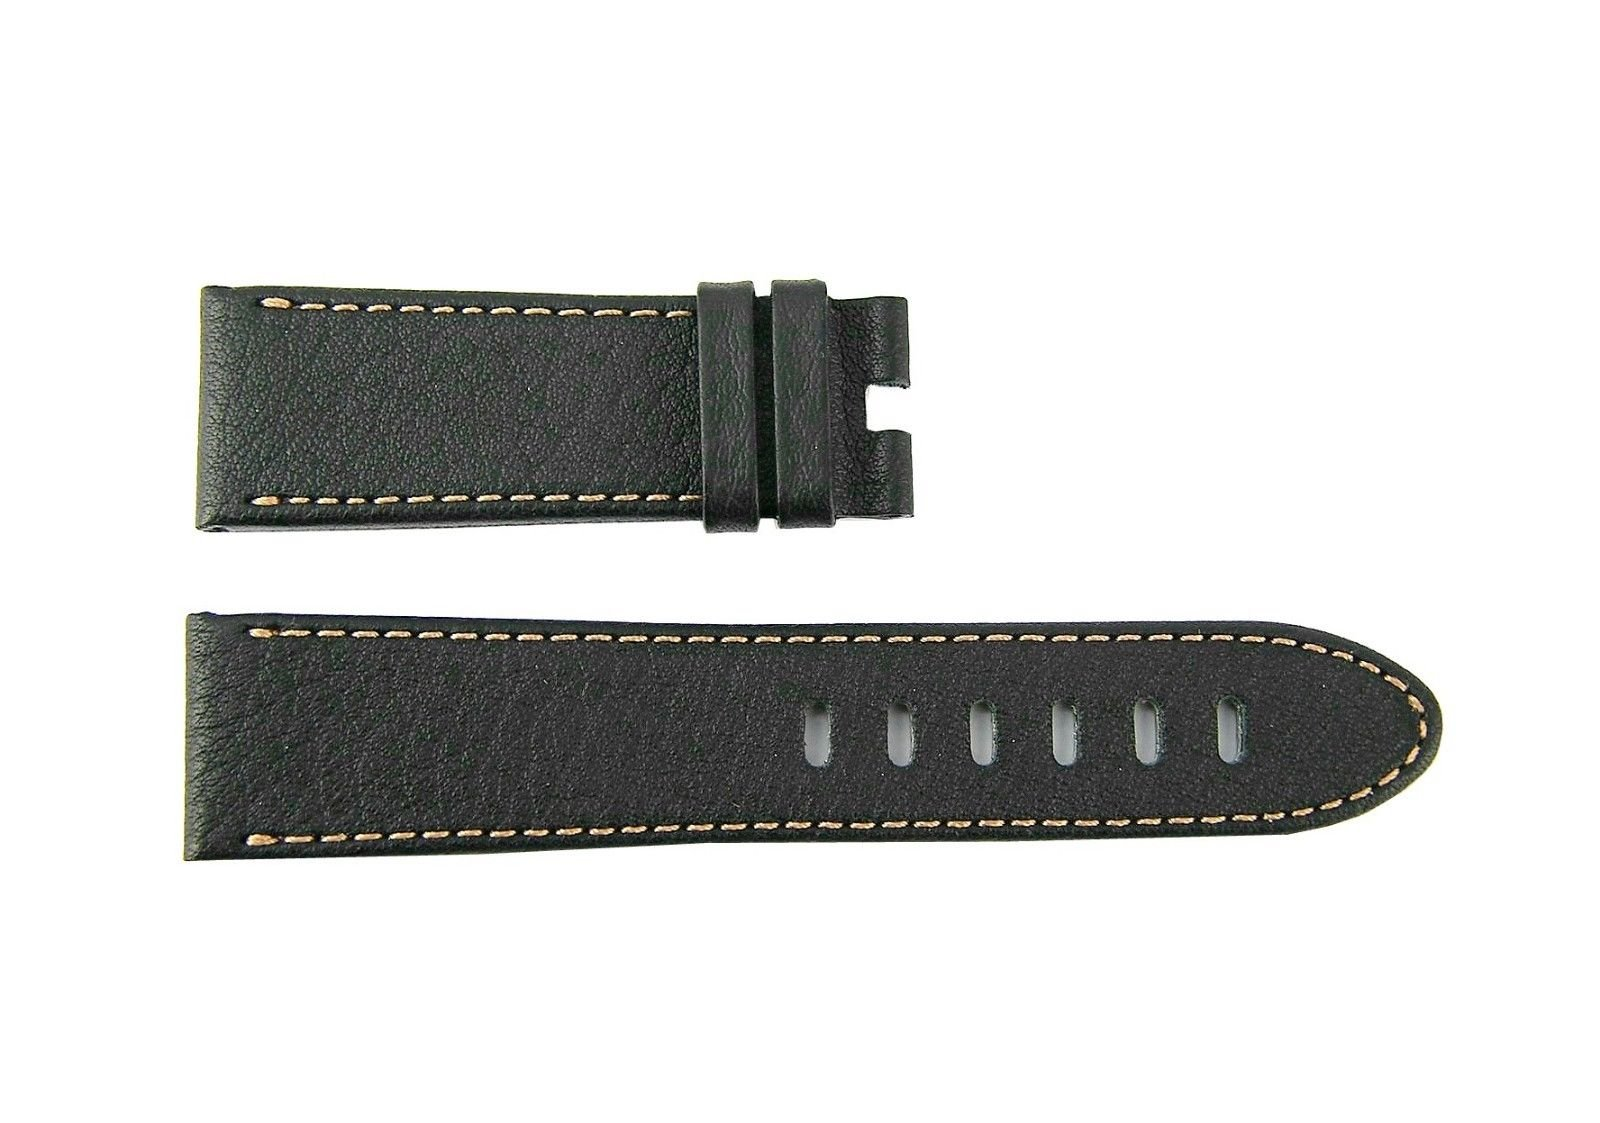 MONTBLANC TIMEWALKER XL Brown Calf Leather Strap 5.5''/3.25''/22mm Swiss 106735#27